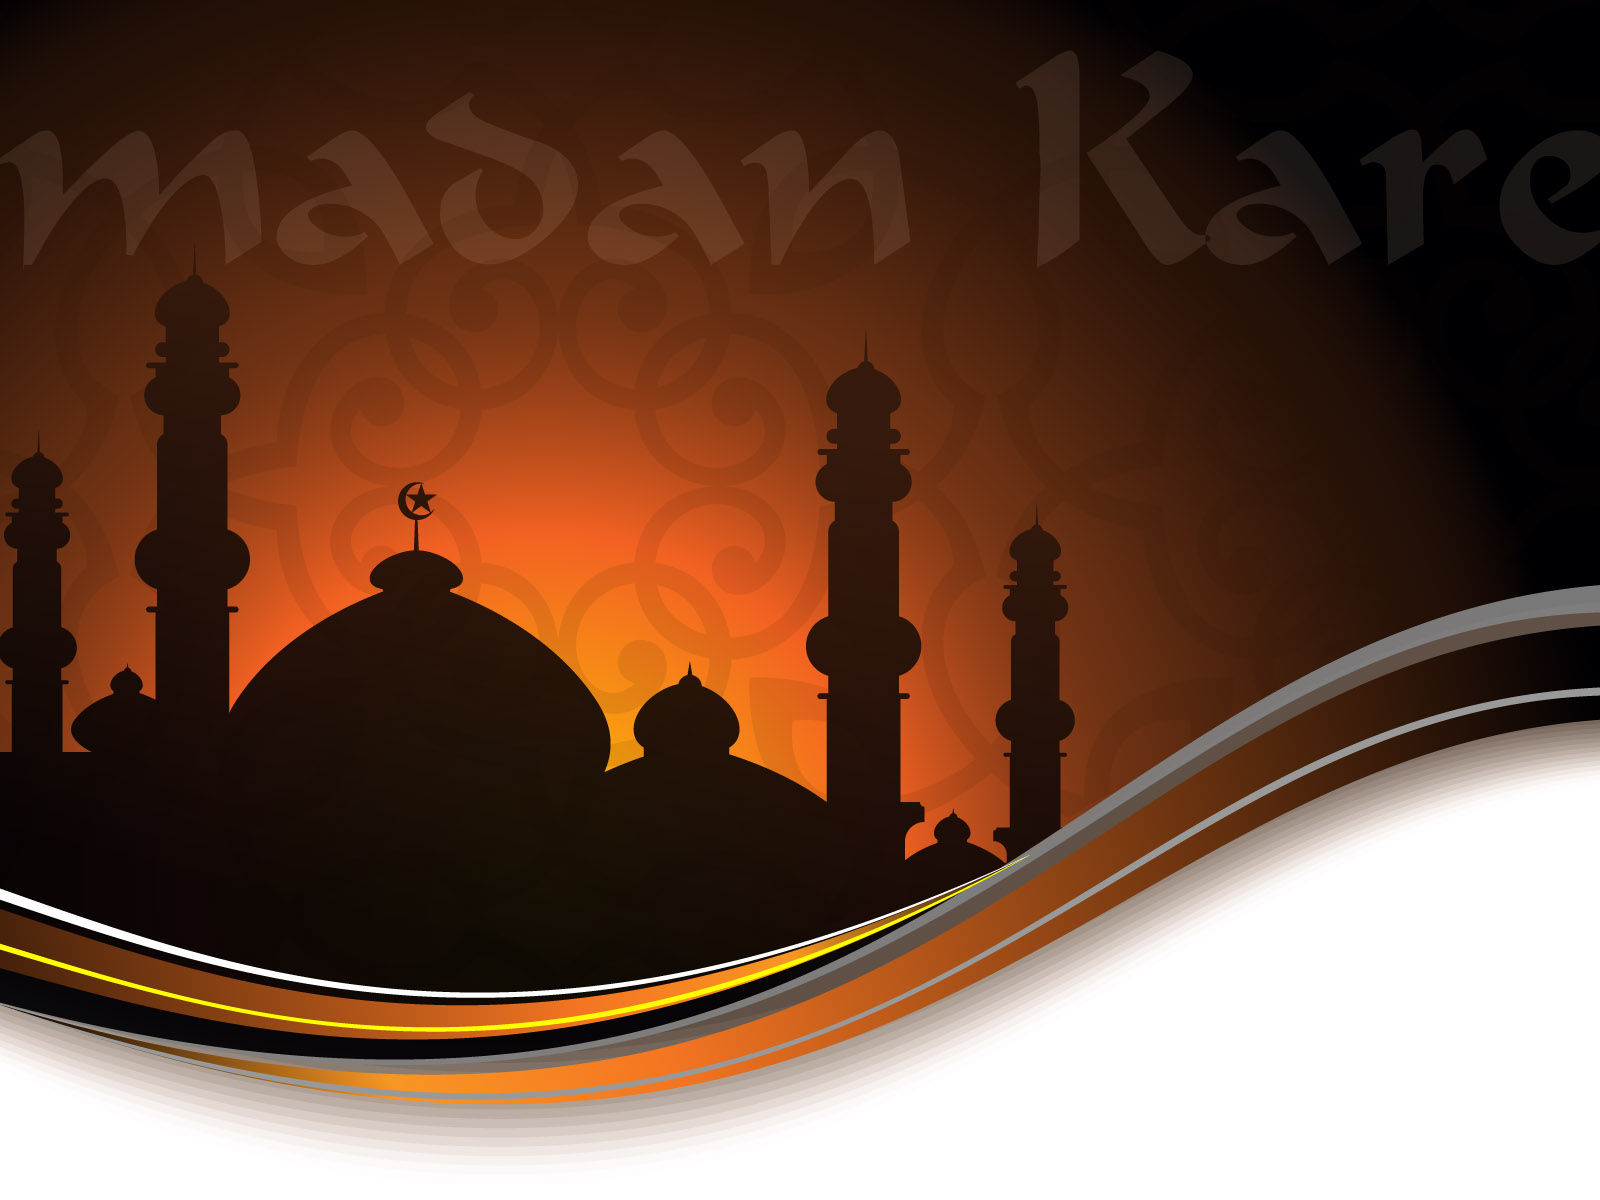 Islamic Ramadan Kareem Slide For Muslims Backgrounds Black Brown